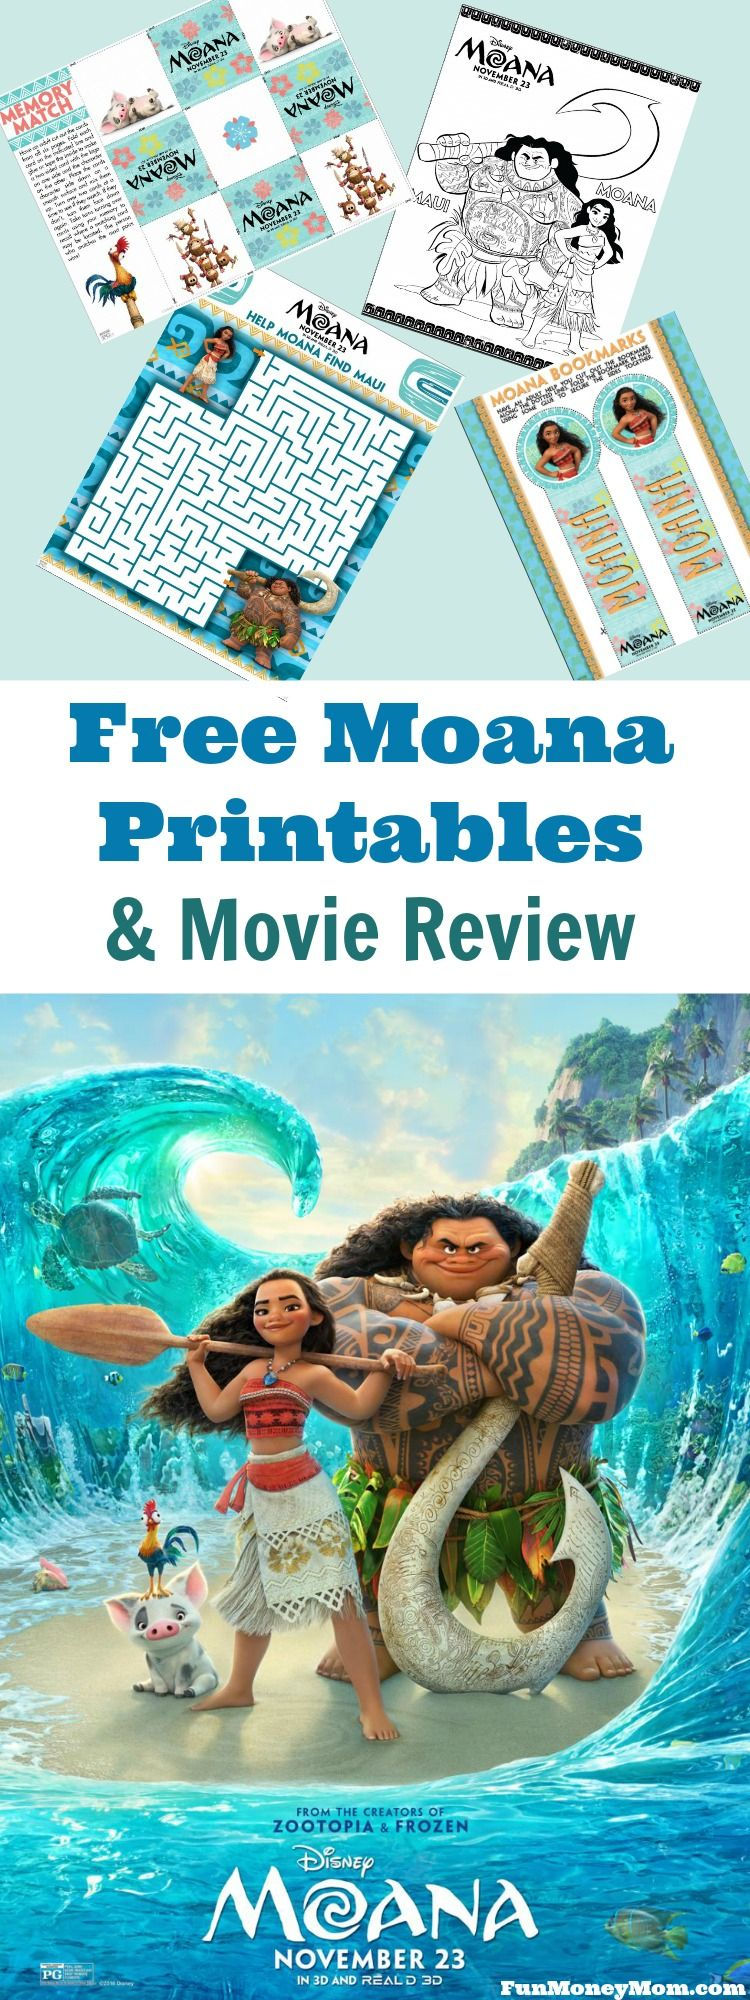 Free moana printables u movie review moana movie and gaming